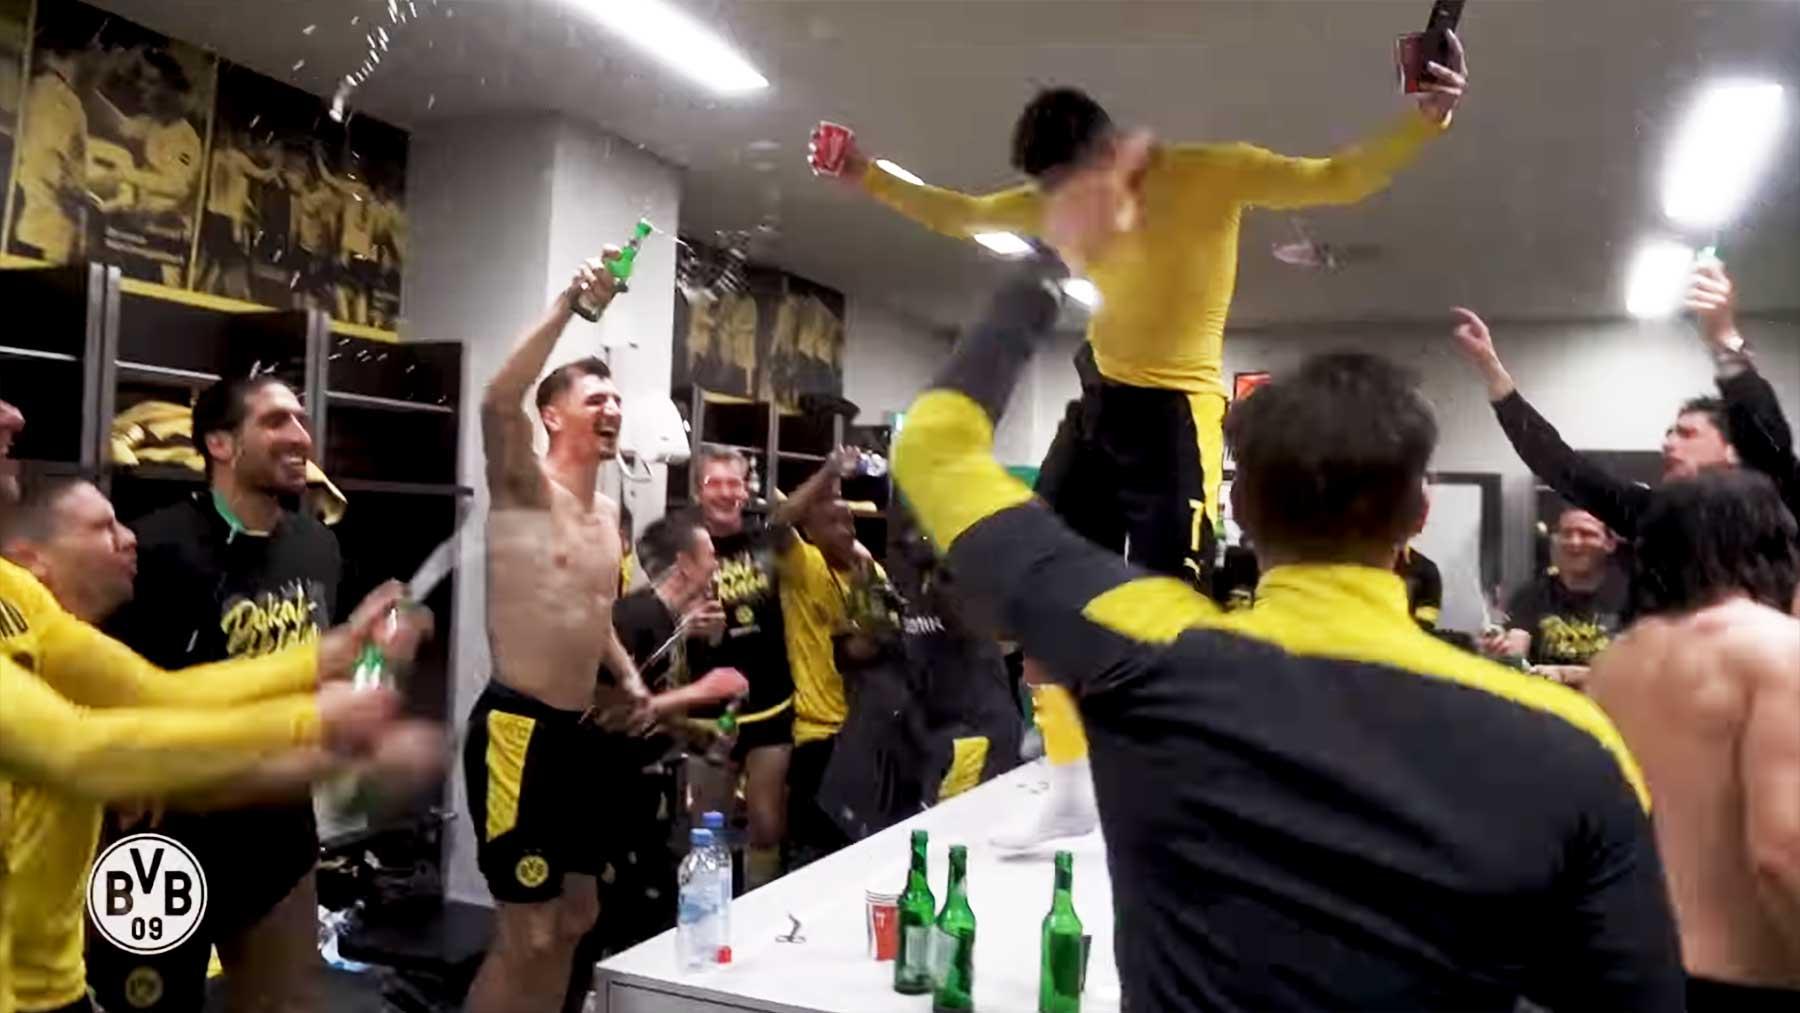 BVB Inside DFB-Pokal Finale: Reportage-Eindrücke zum Titelgewinn